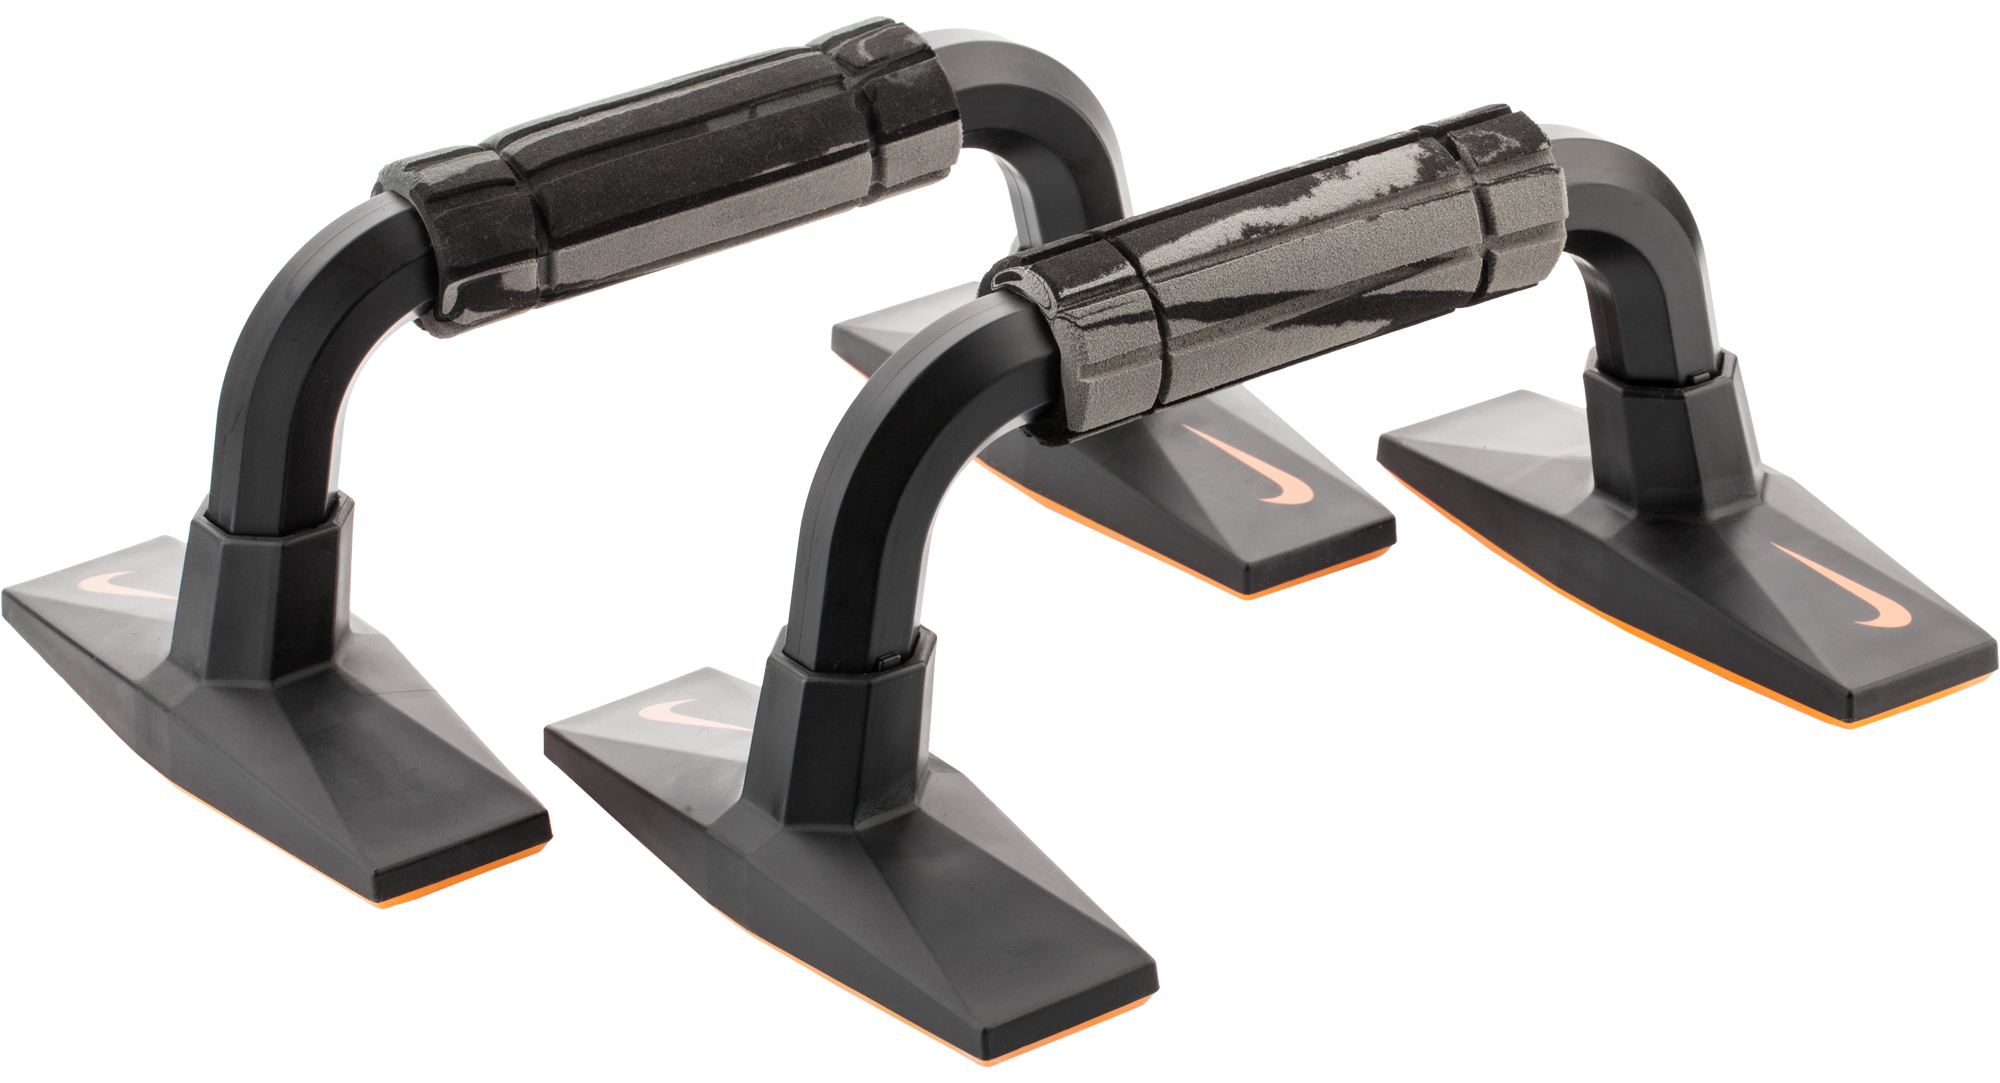 все цены на Nike Упоры для отжиманий Nike Accessories Push Up Grips, 2 шт онлайн